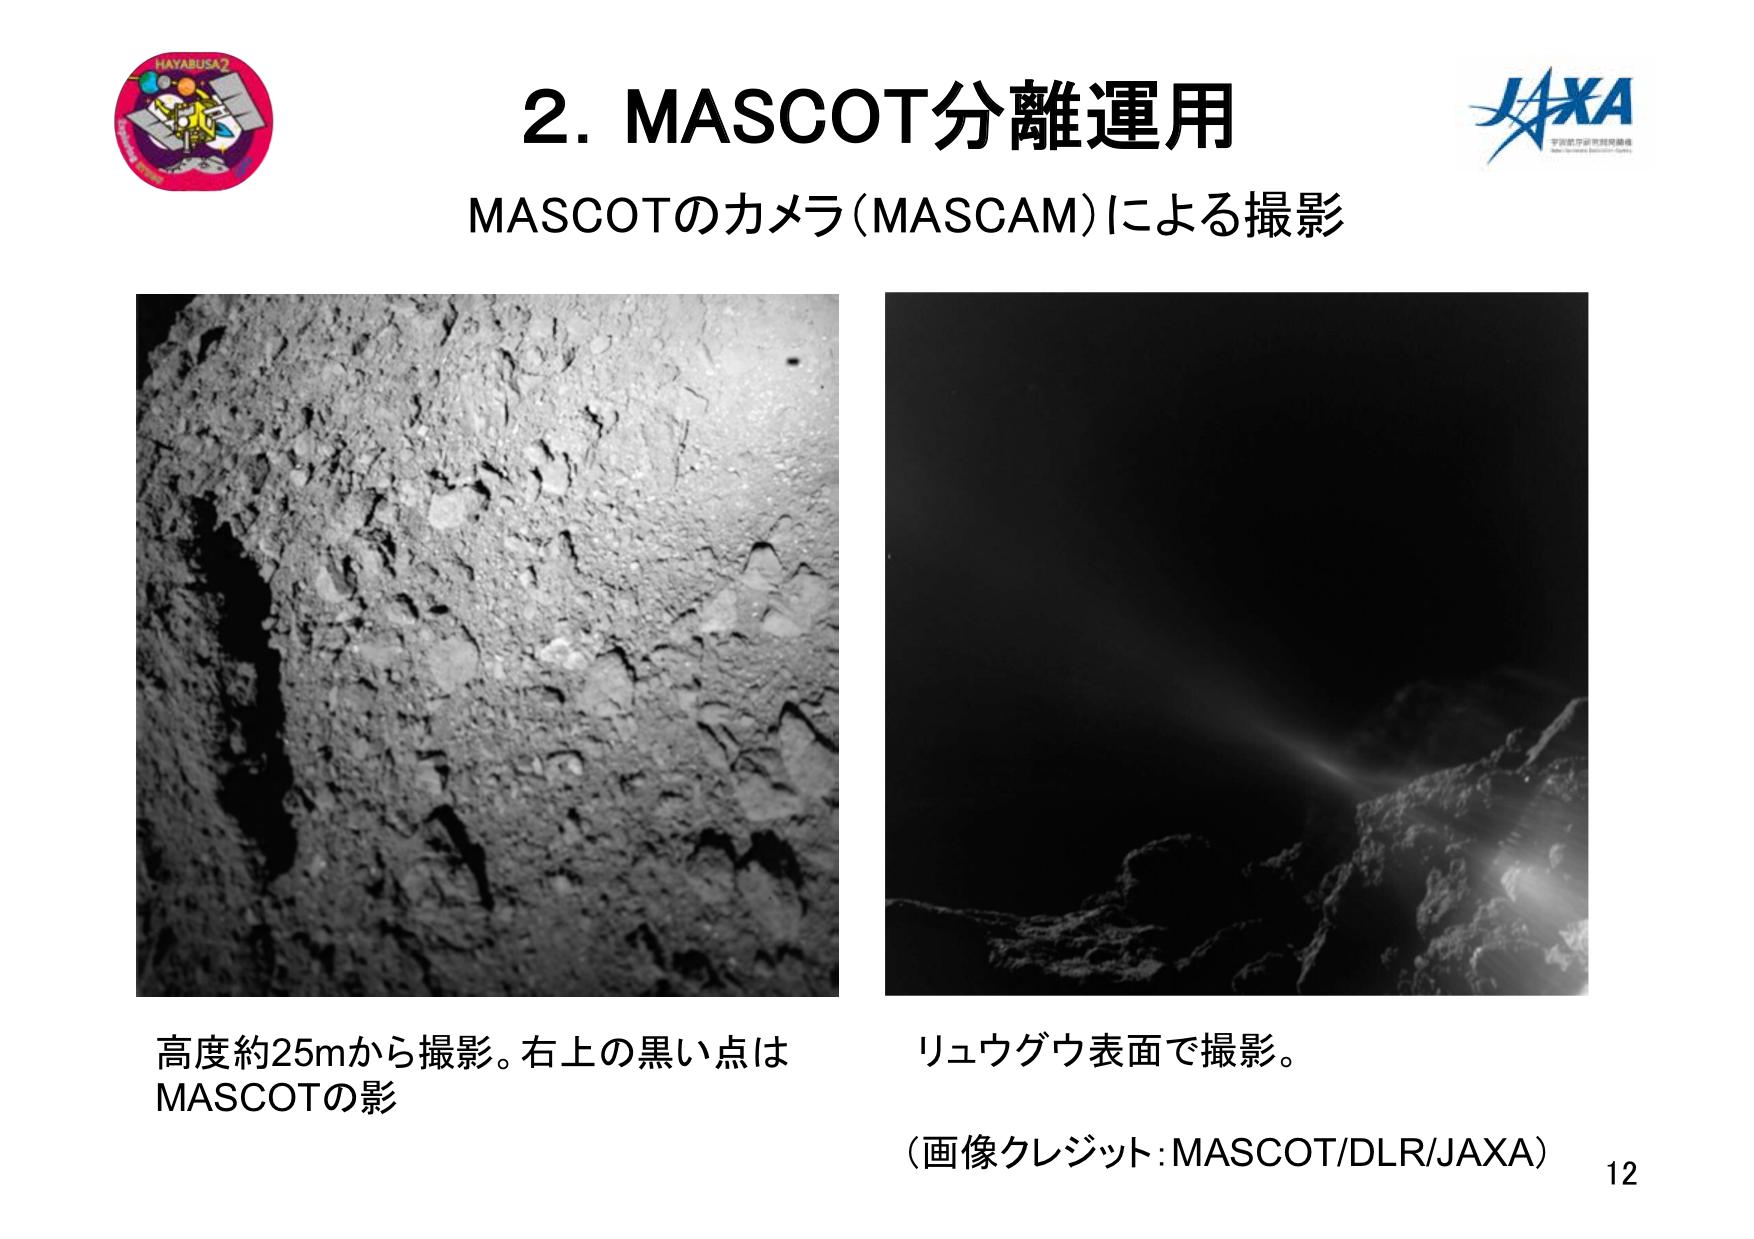 f:id:Imamura:20181011153951p:plain